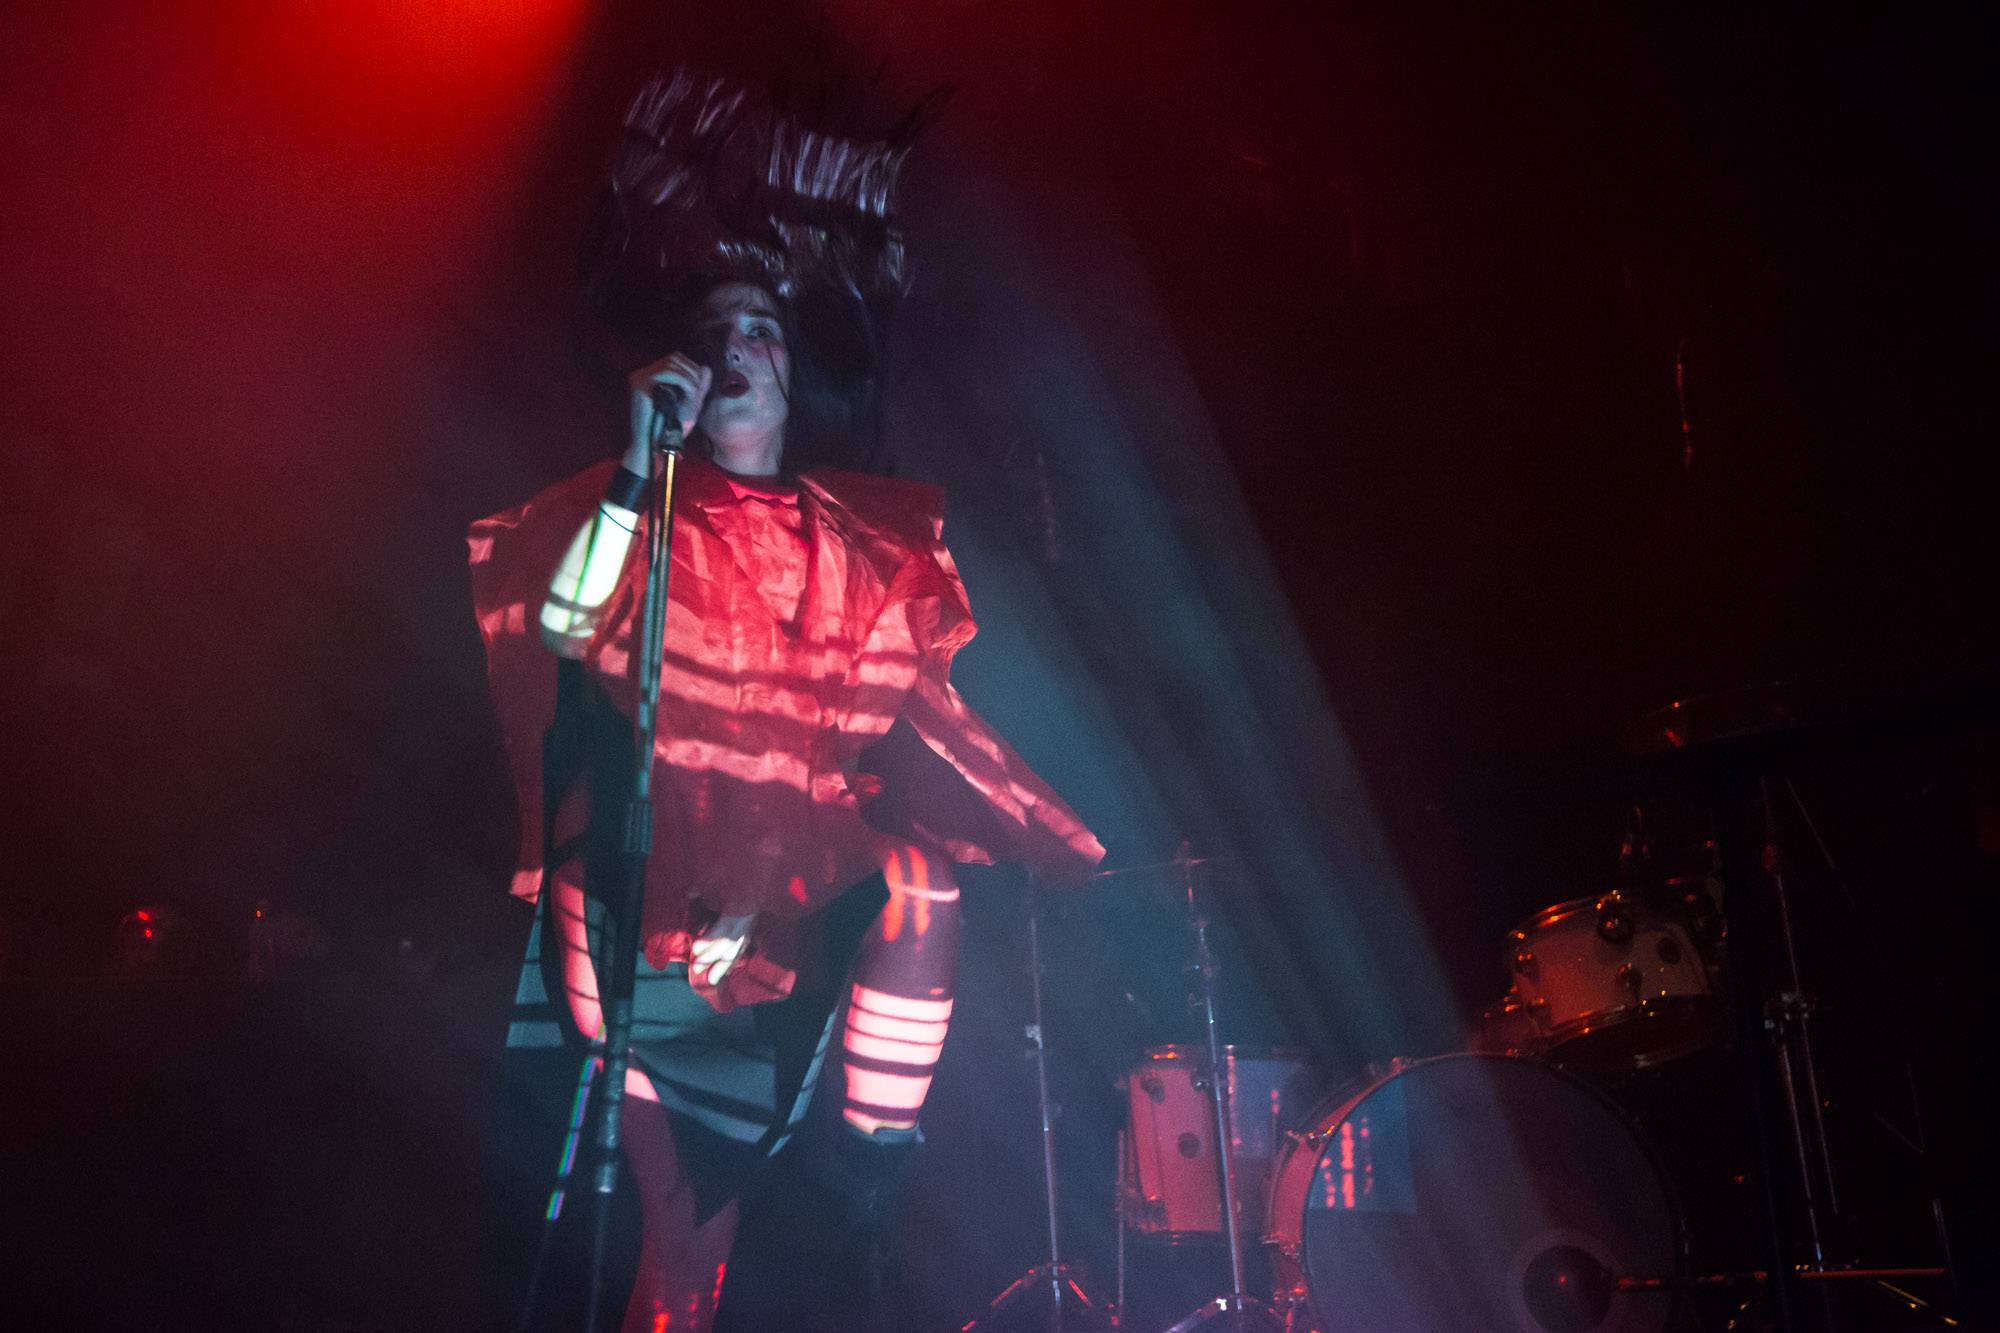 Zola Jesus at the Rickshaw Theatre, Vancouver, May 2 2018. Kirk Chantraine photo.